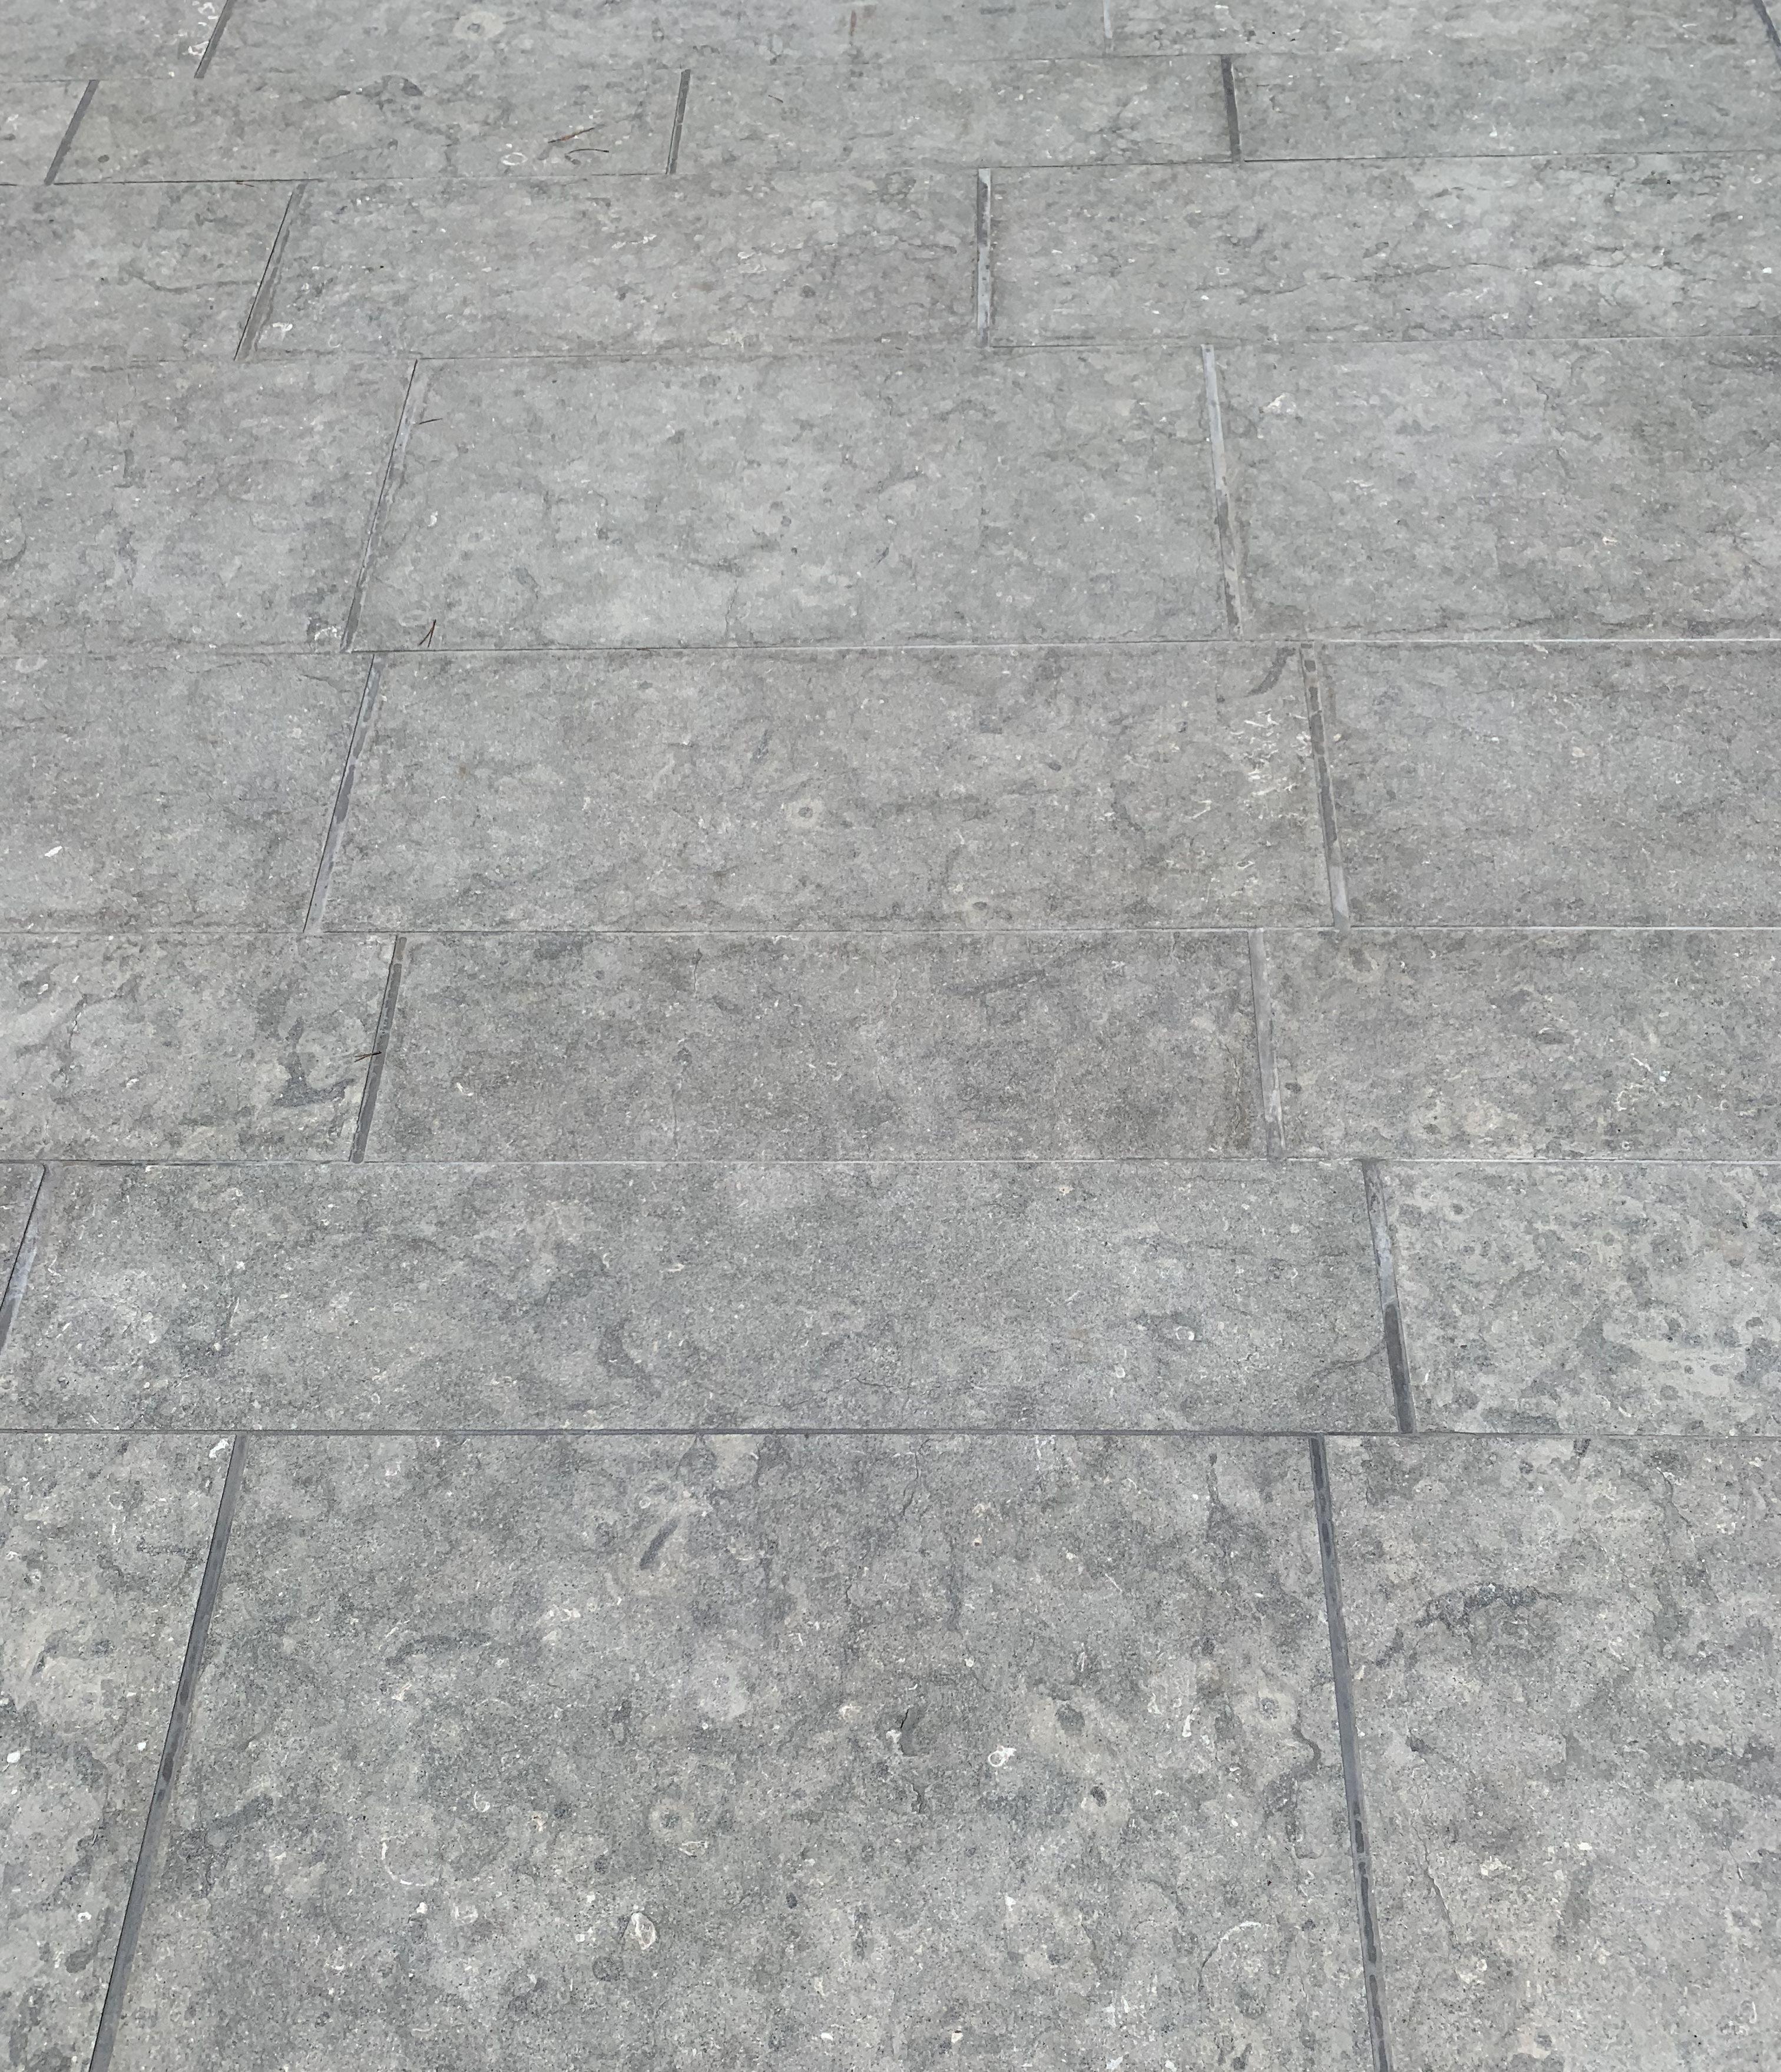 Dallage En Pierre Grise Antiderapante Terrasse Plage De Piscine